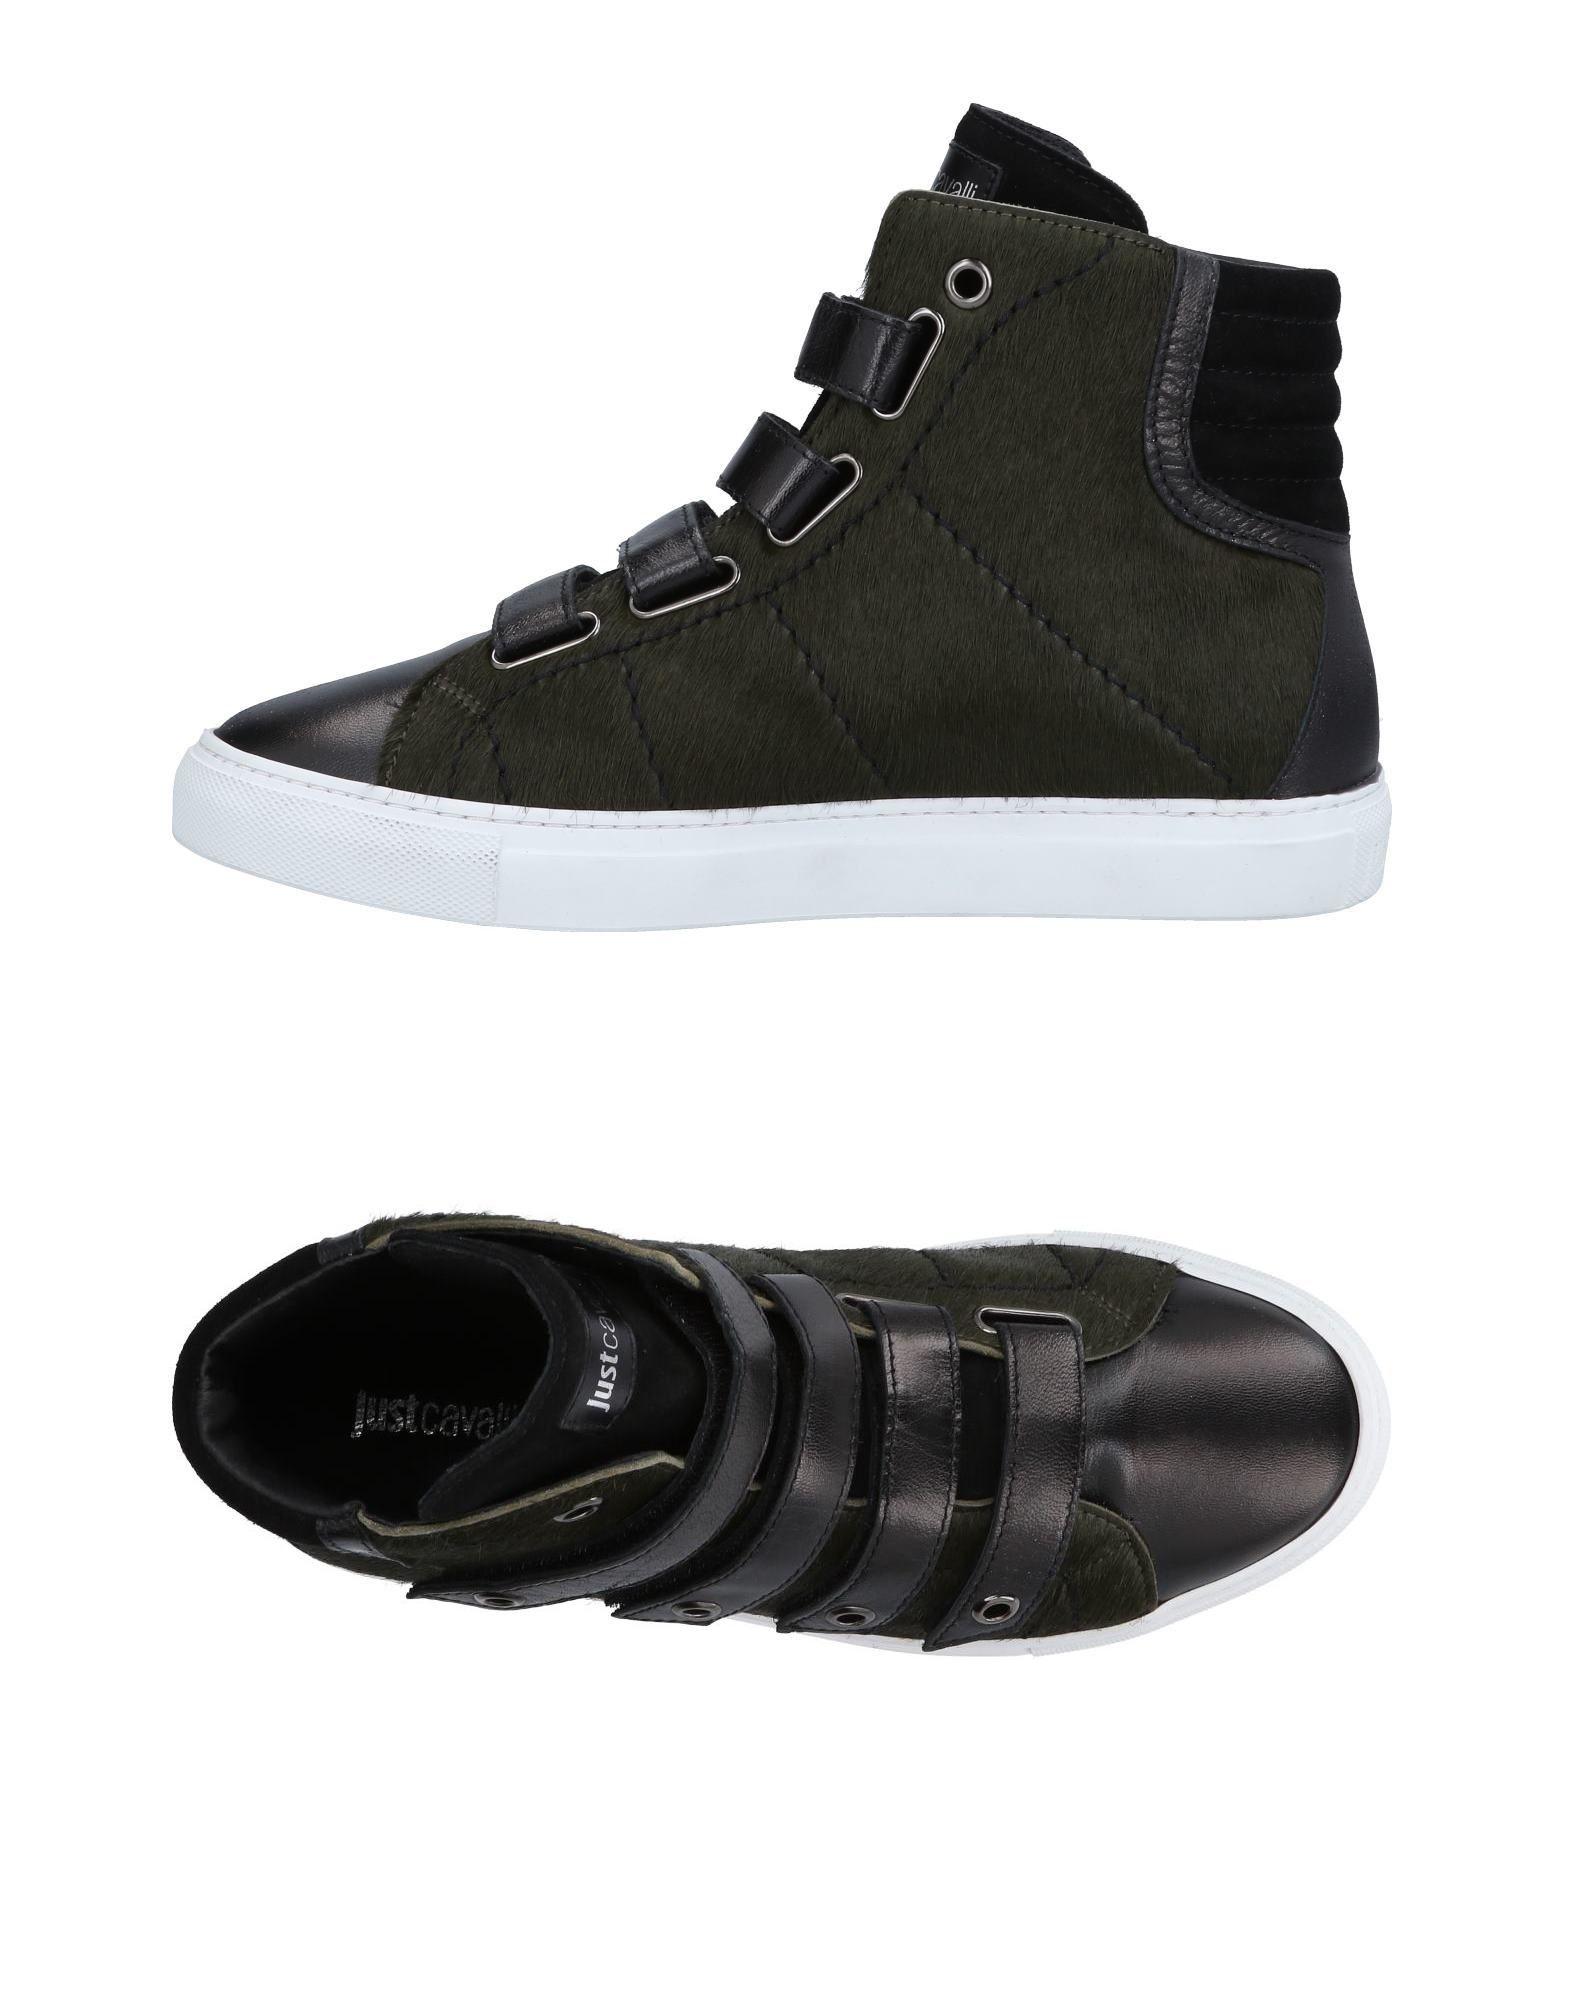 Just Cavalli Sneakers Herren  11498167BU Gute Qualität beliebte Schuhe